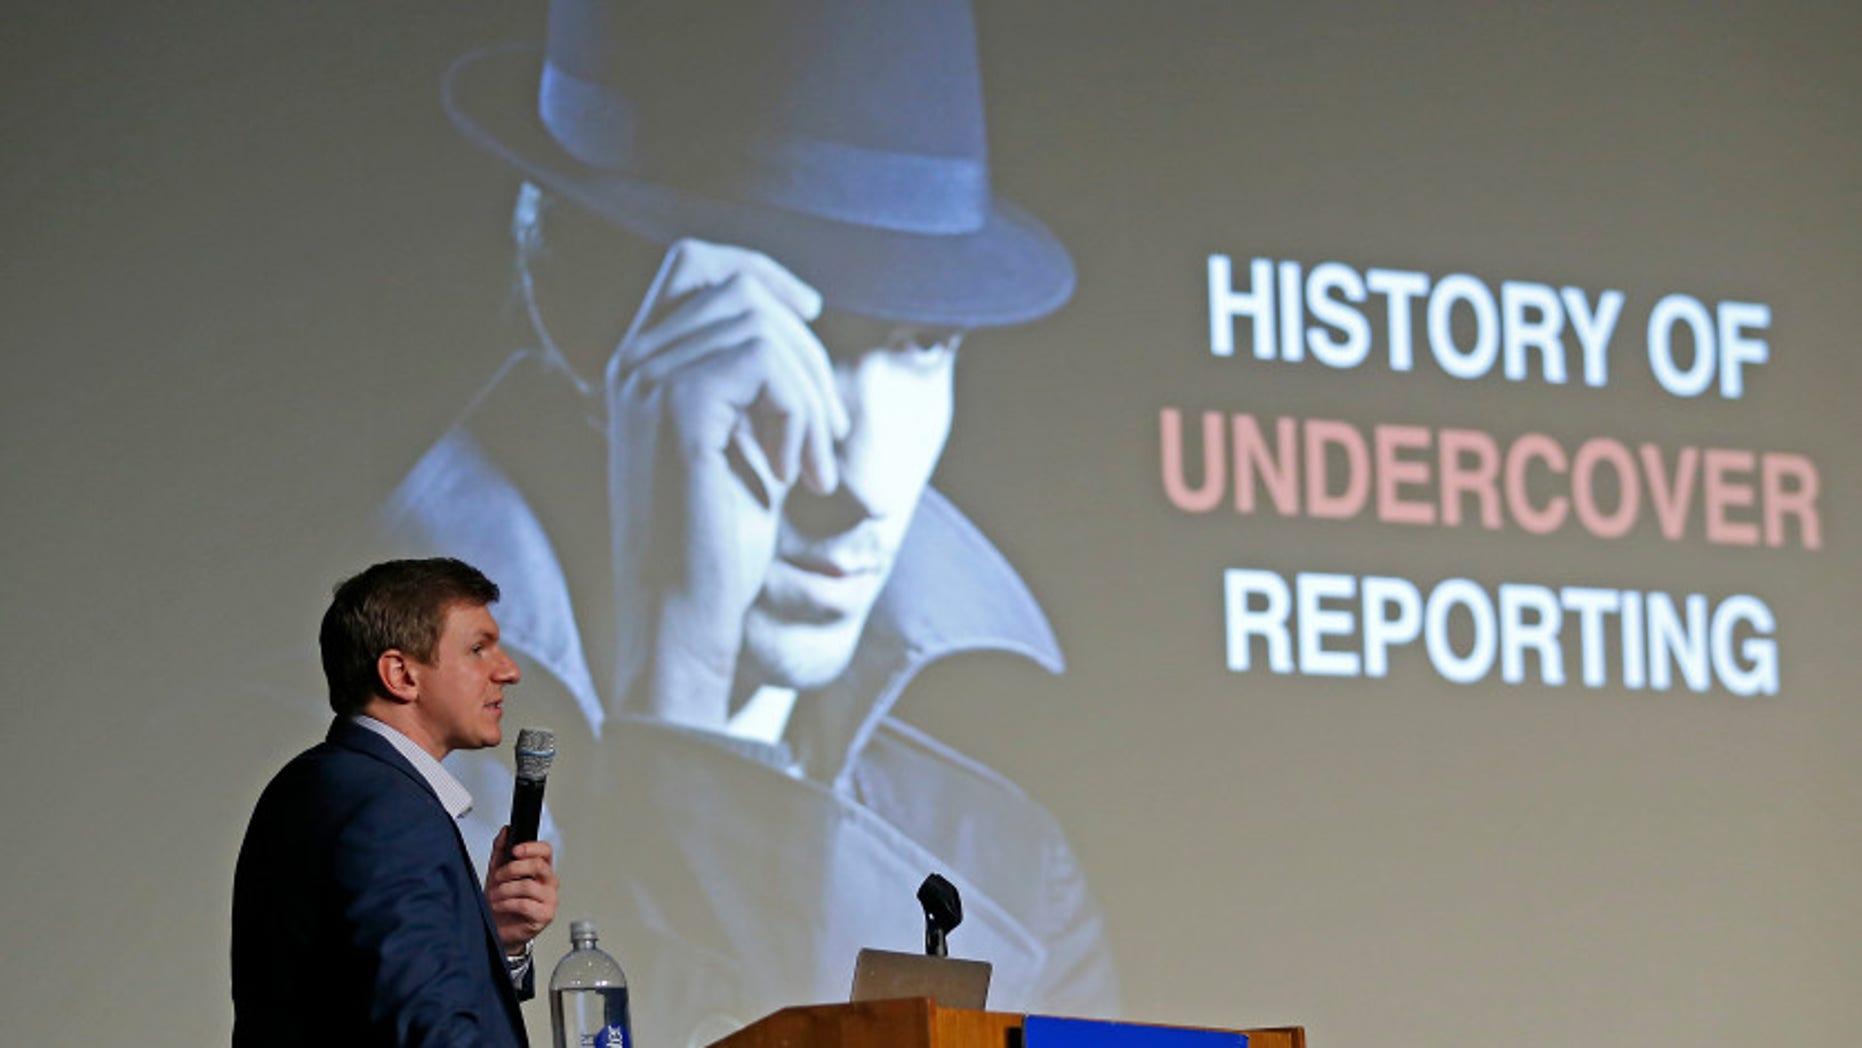 James O'Keefe, of Project Veritas, speaks at Southern Methodist University in Dallas, Nov. 29, 2017.